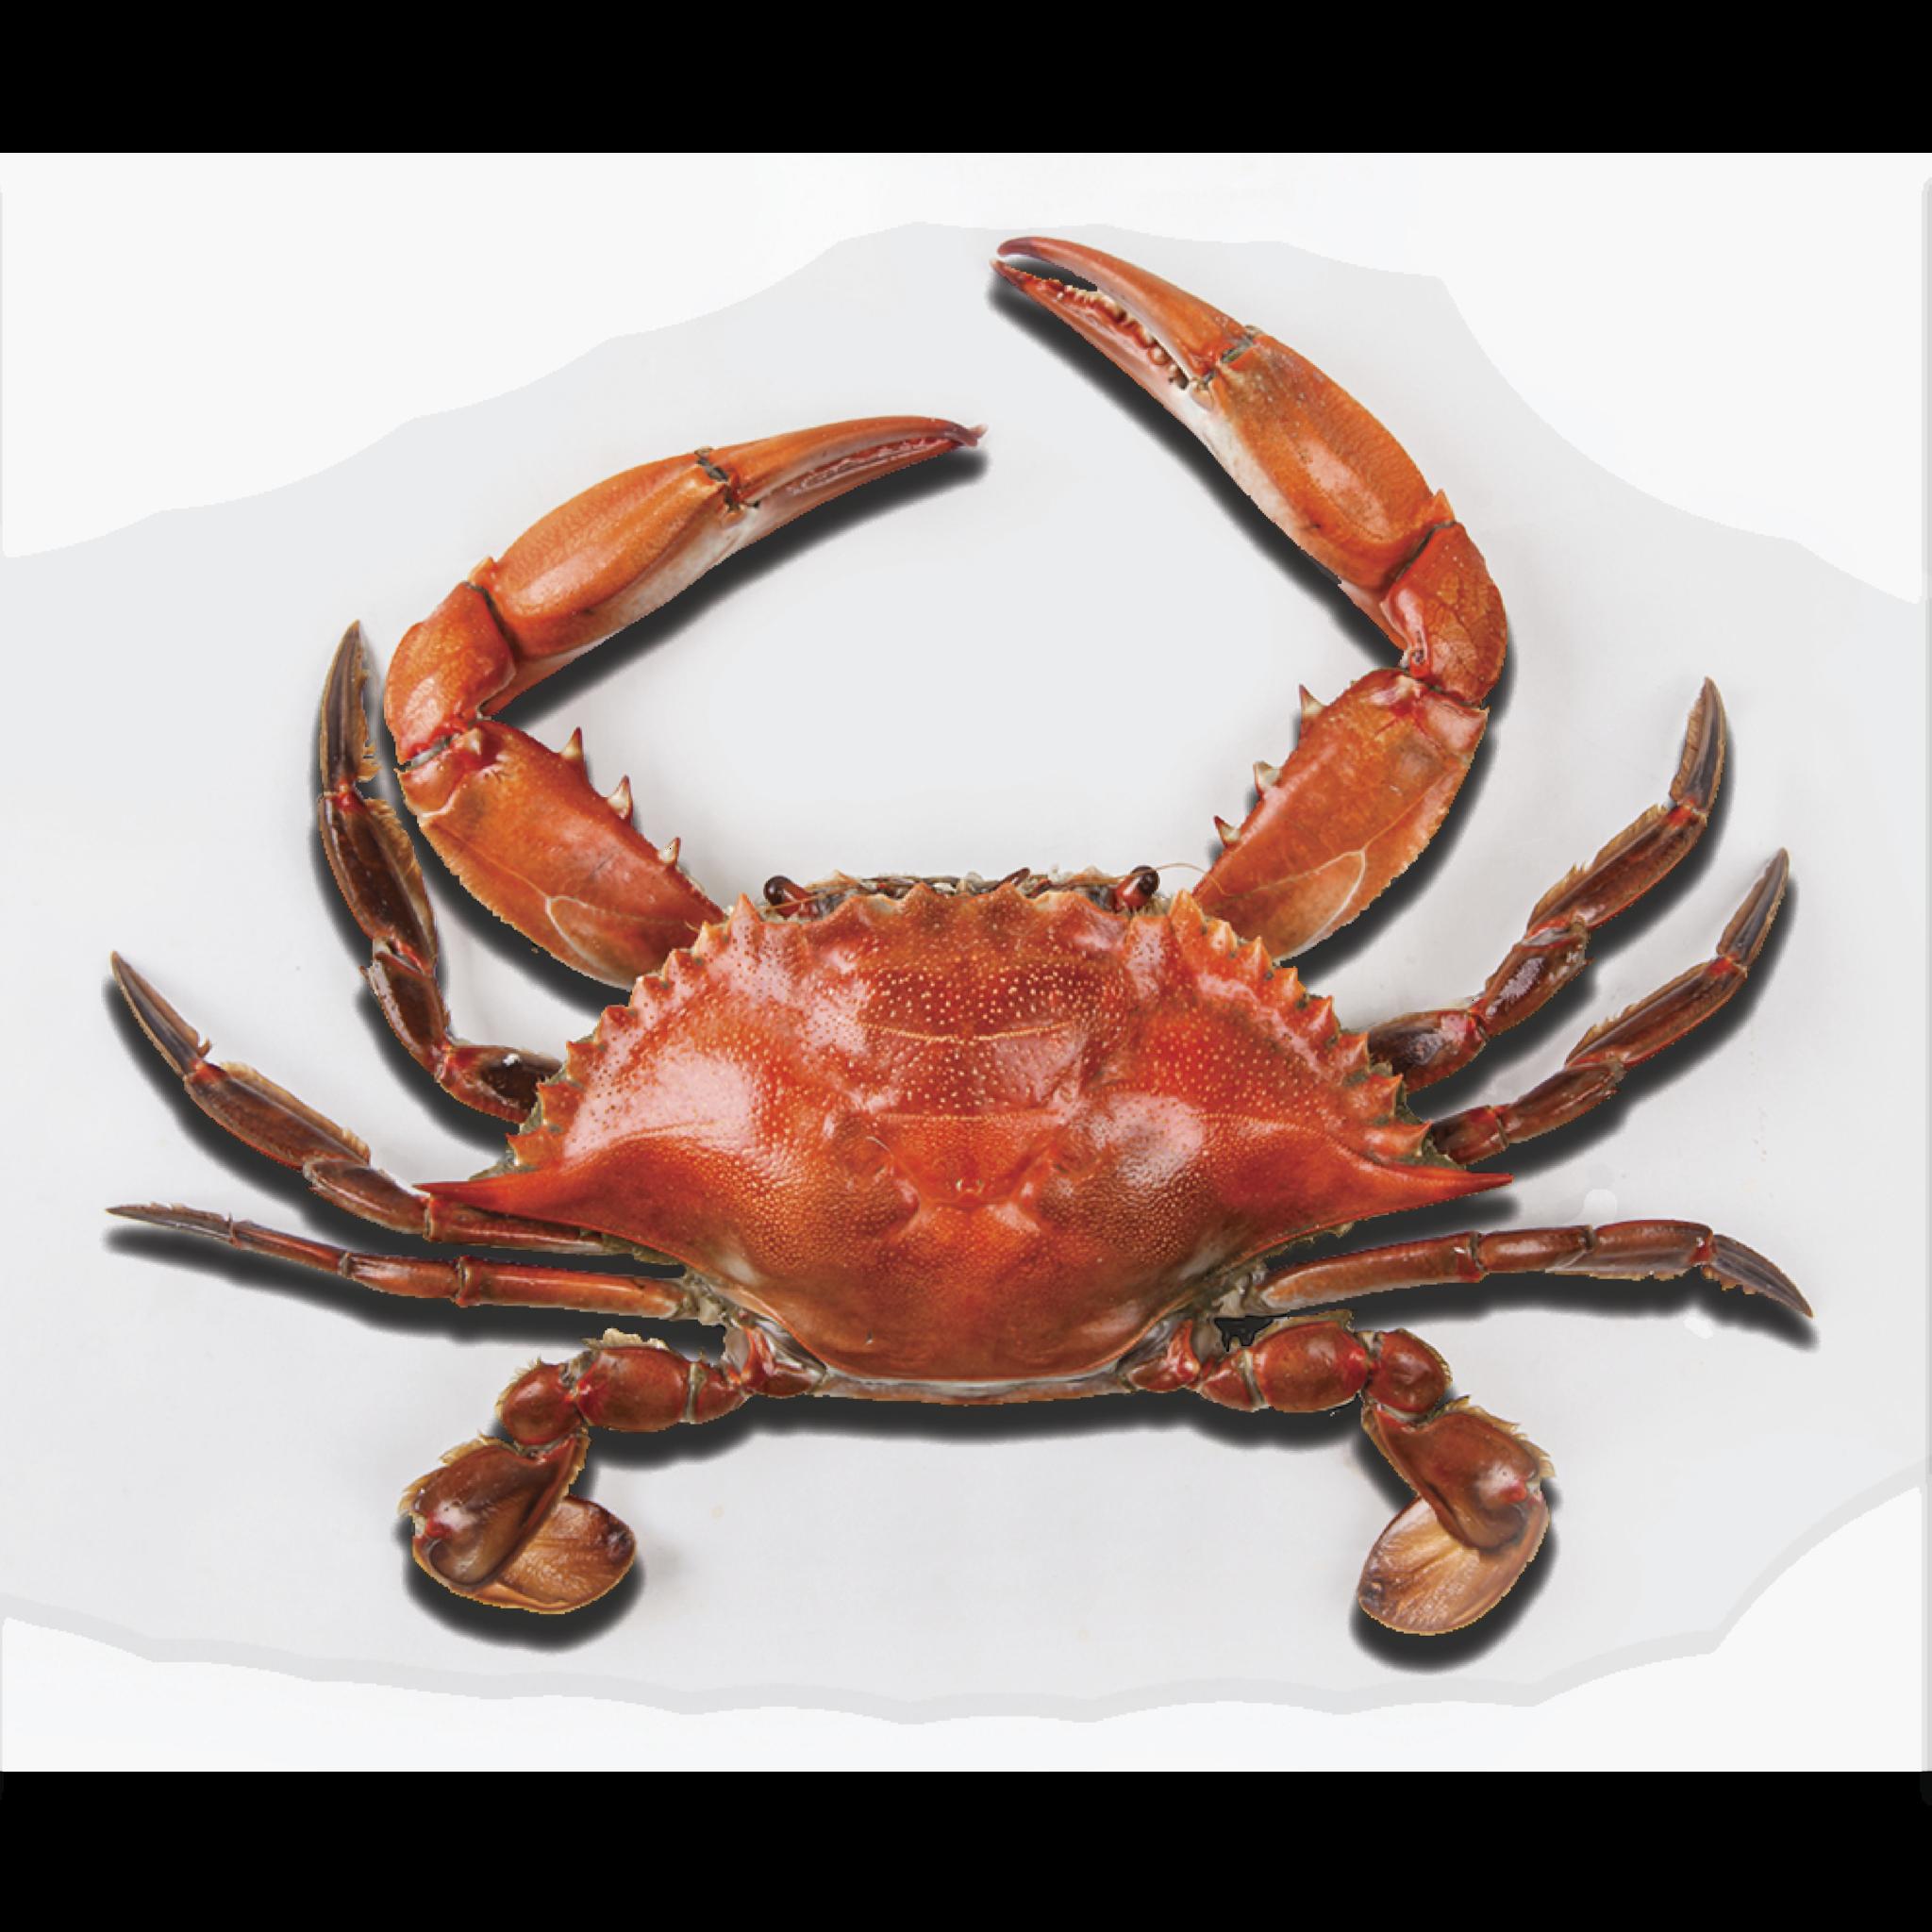 Crabs clipart chilli crab. Png images free dowbload